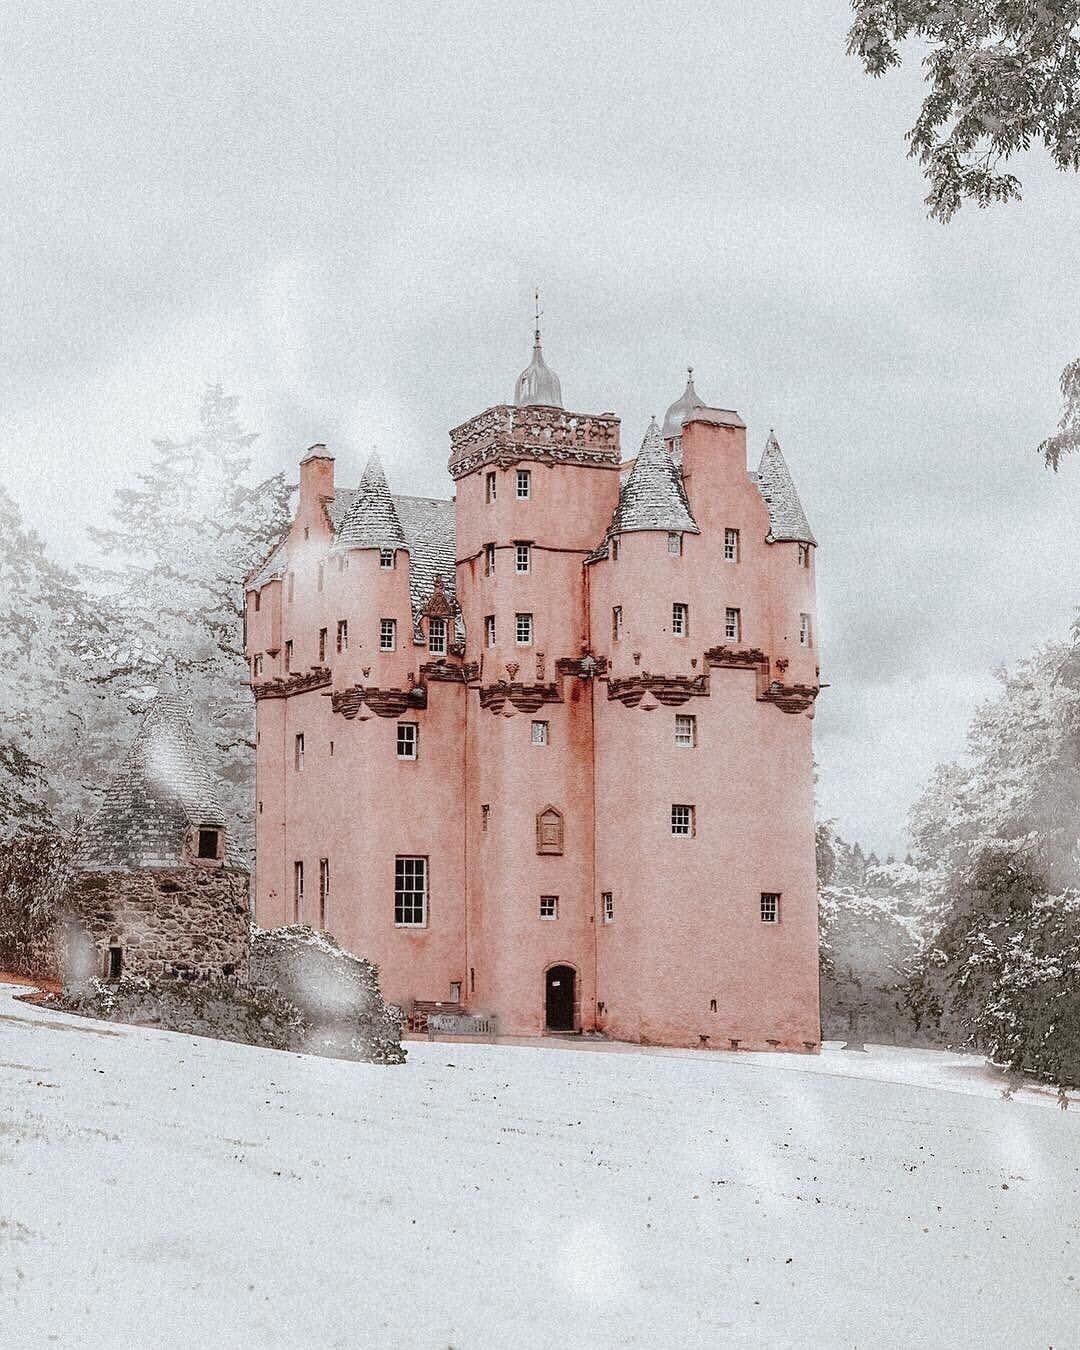 Pin By Jillian On Pink Winter Whispers Scottish Castles Castles In Scotland Castle